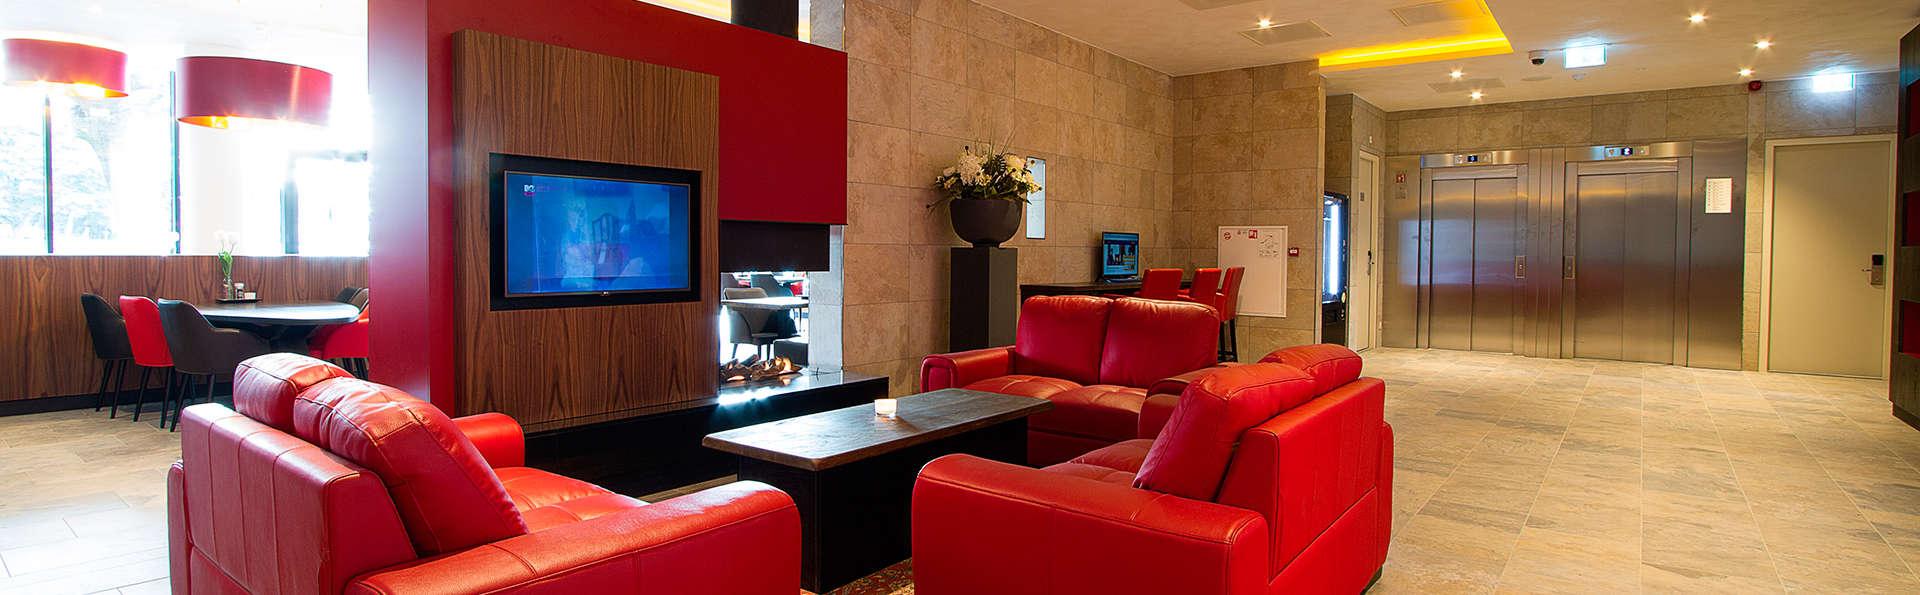 Bastion hotel Eindhoven Waalre - EDIT_lobby.jpg